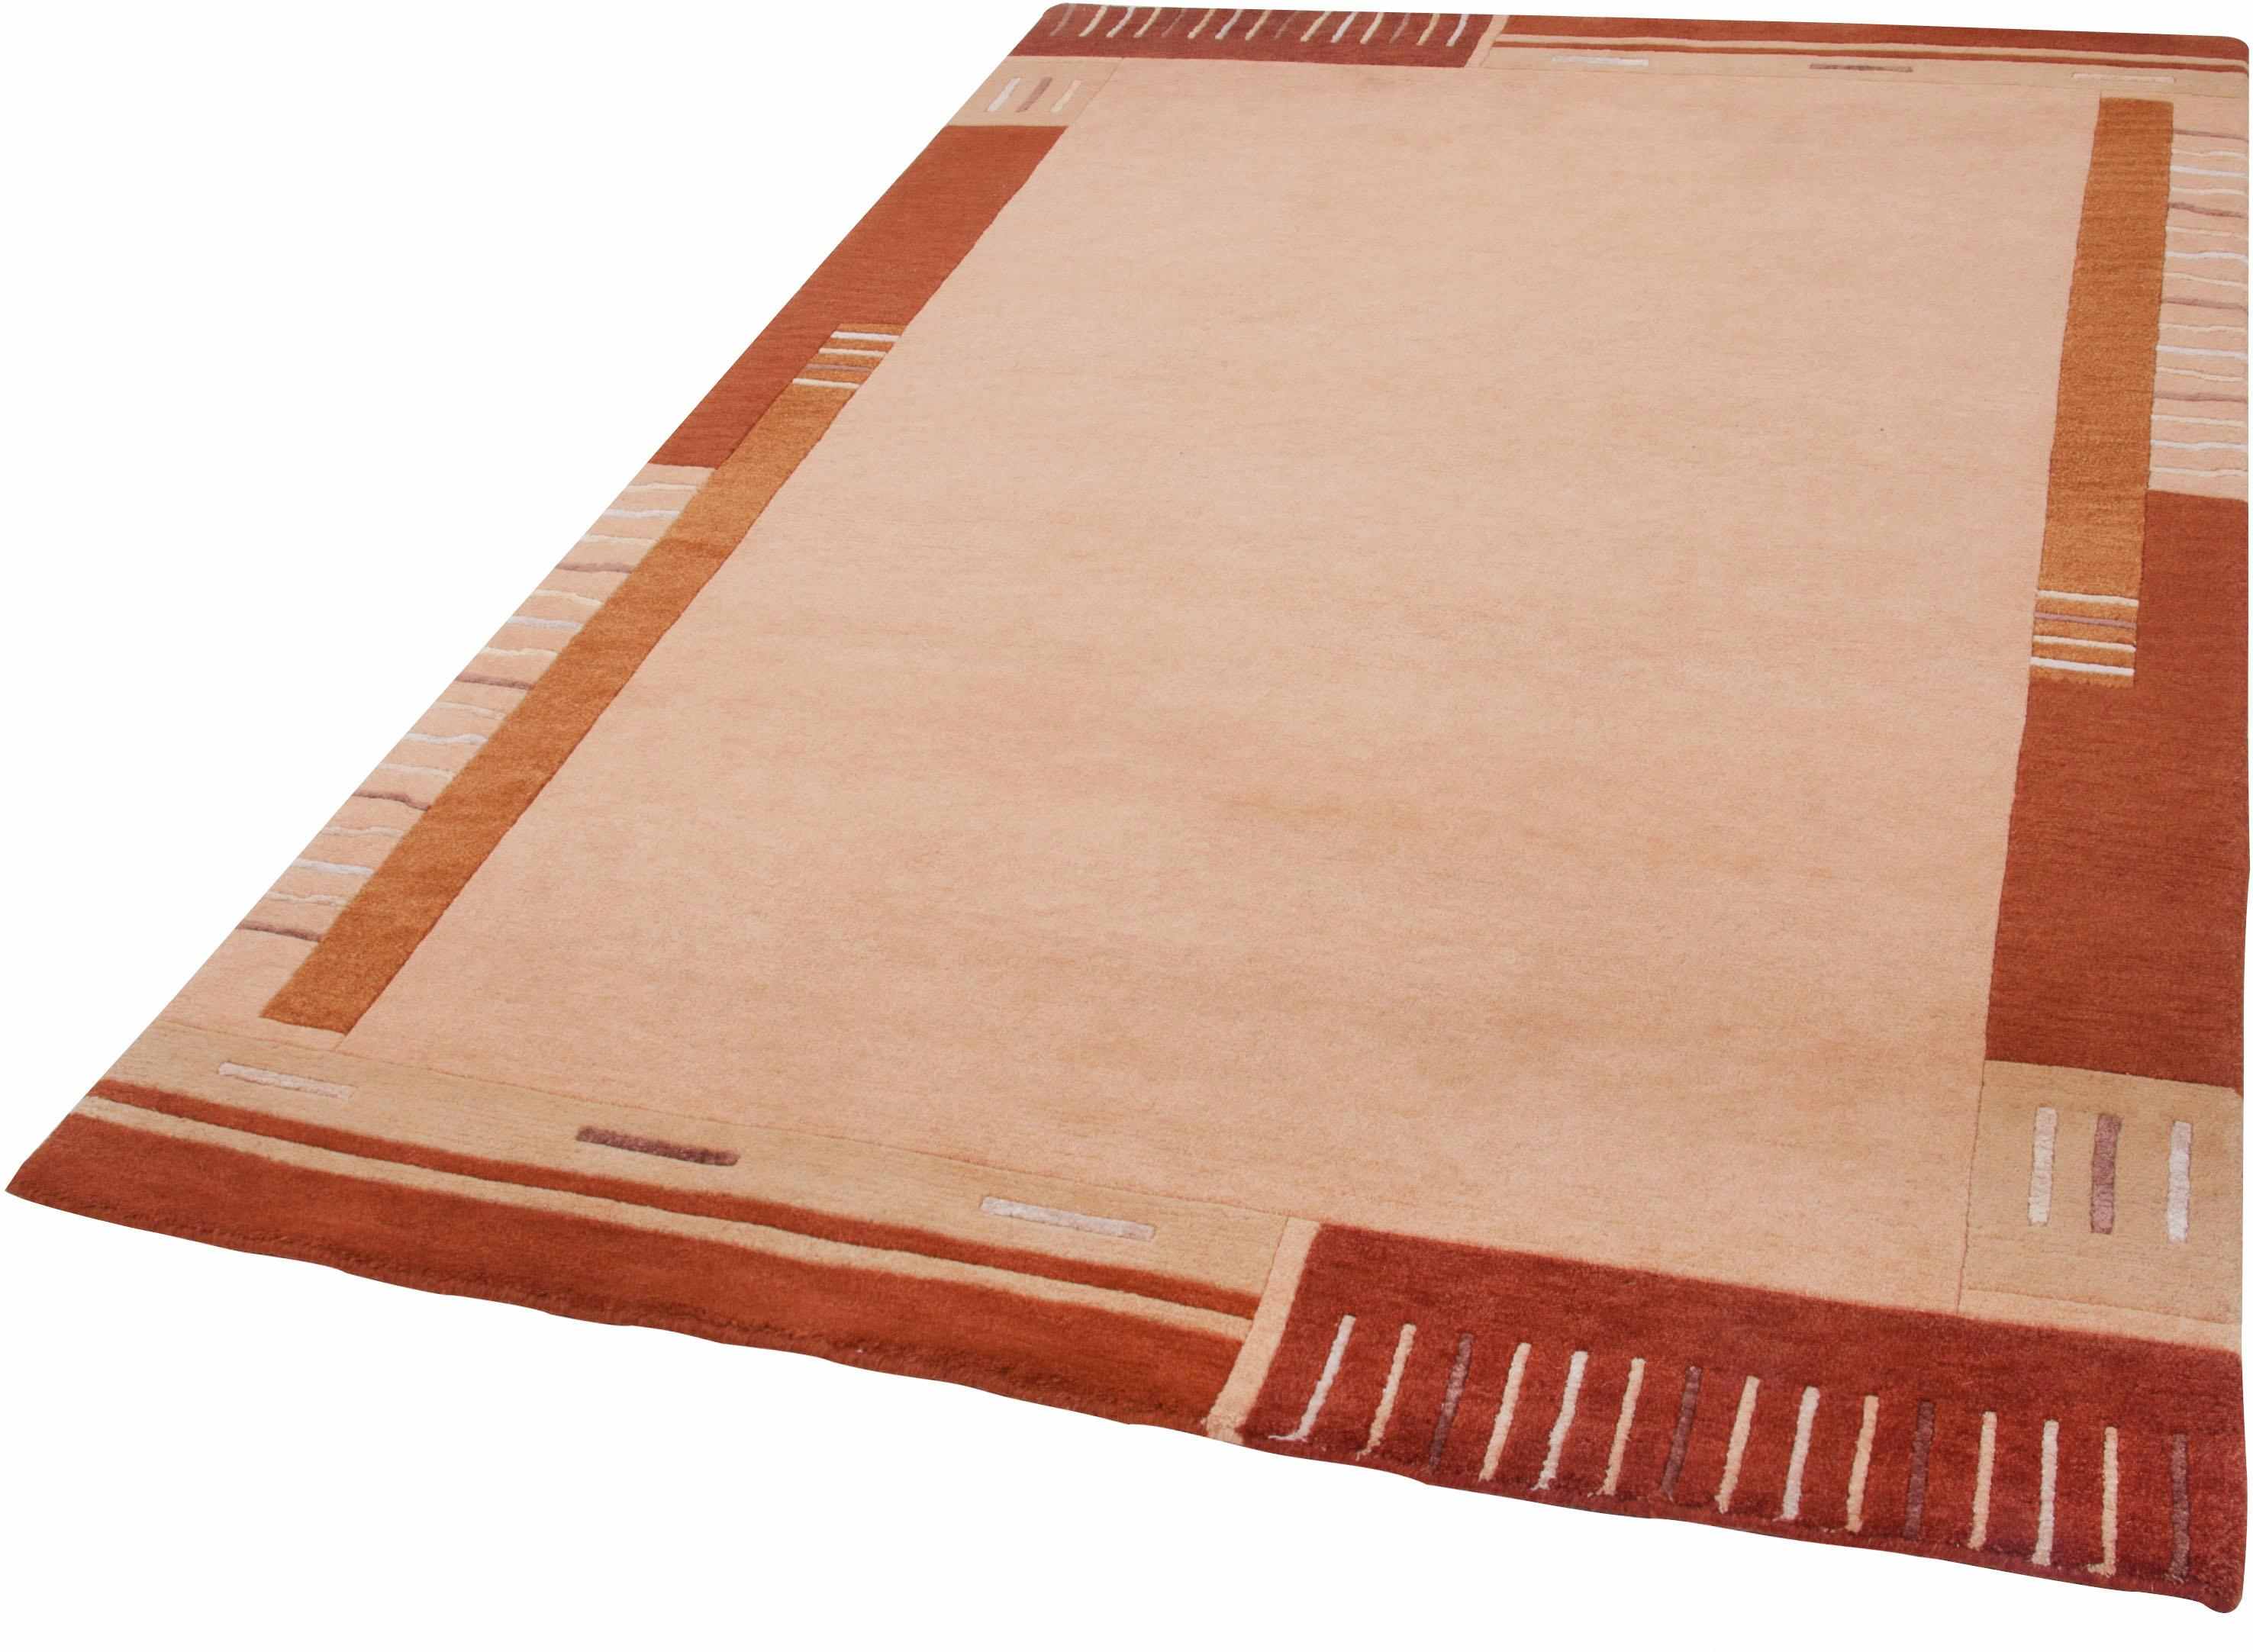 Teppich Vancouver wool THEKO rechteckig Höhe 20 mm manuell geknüpft